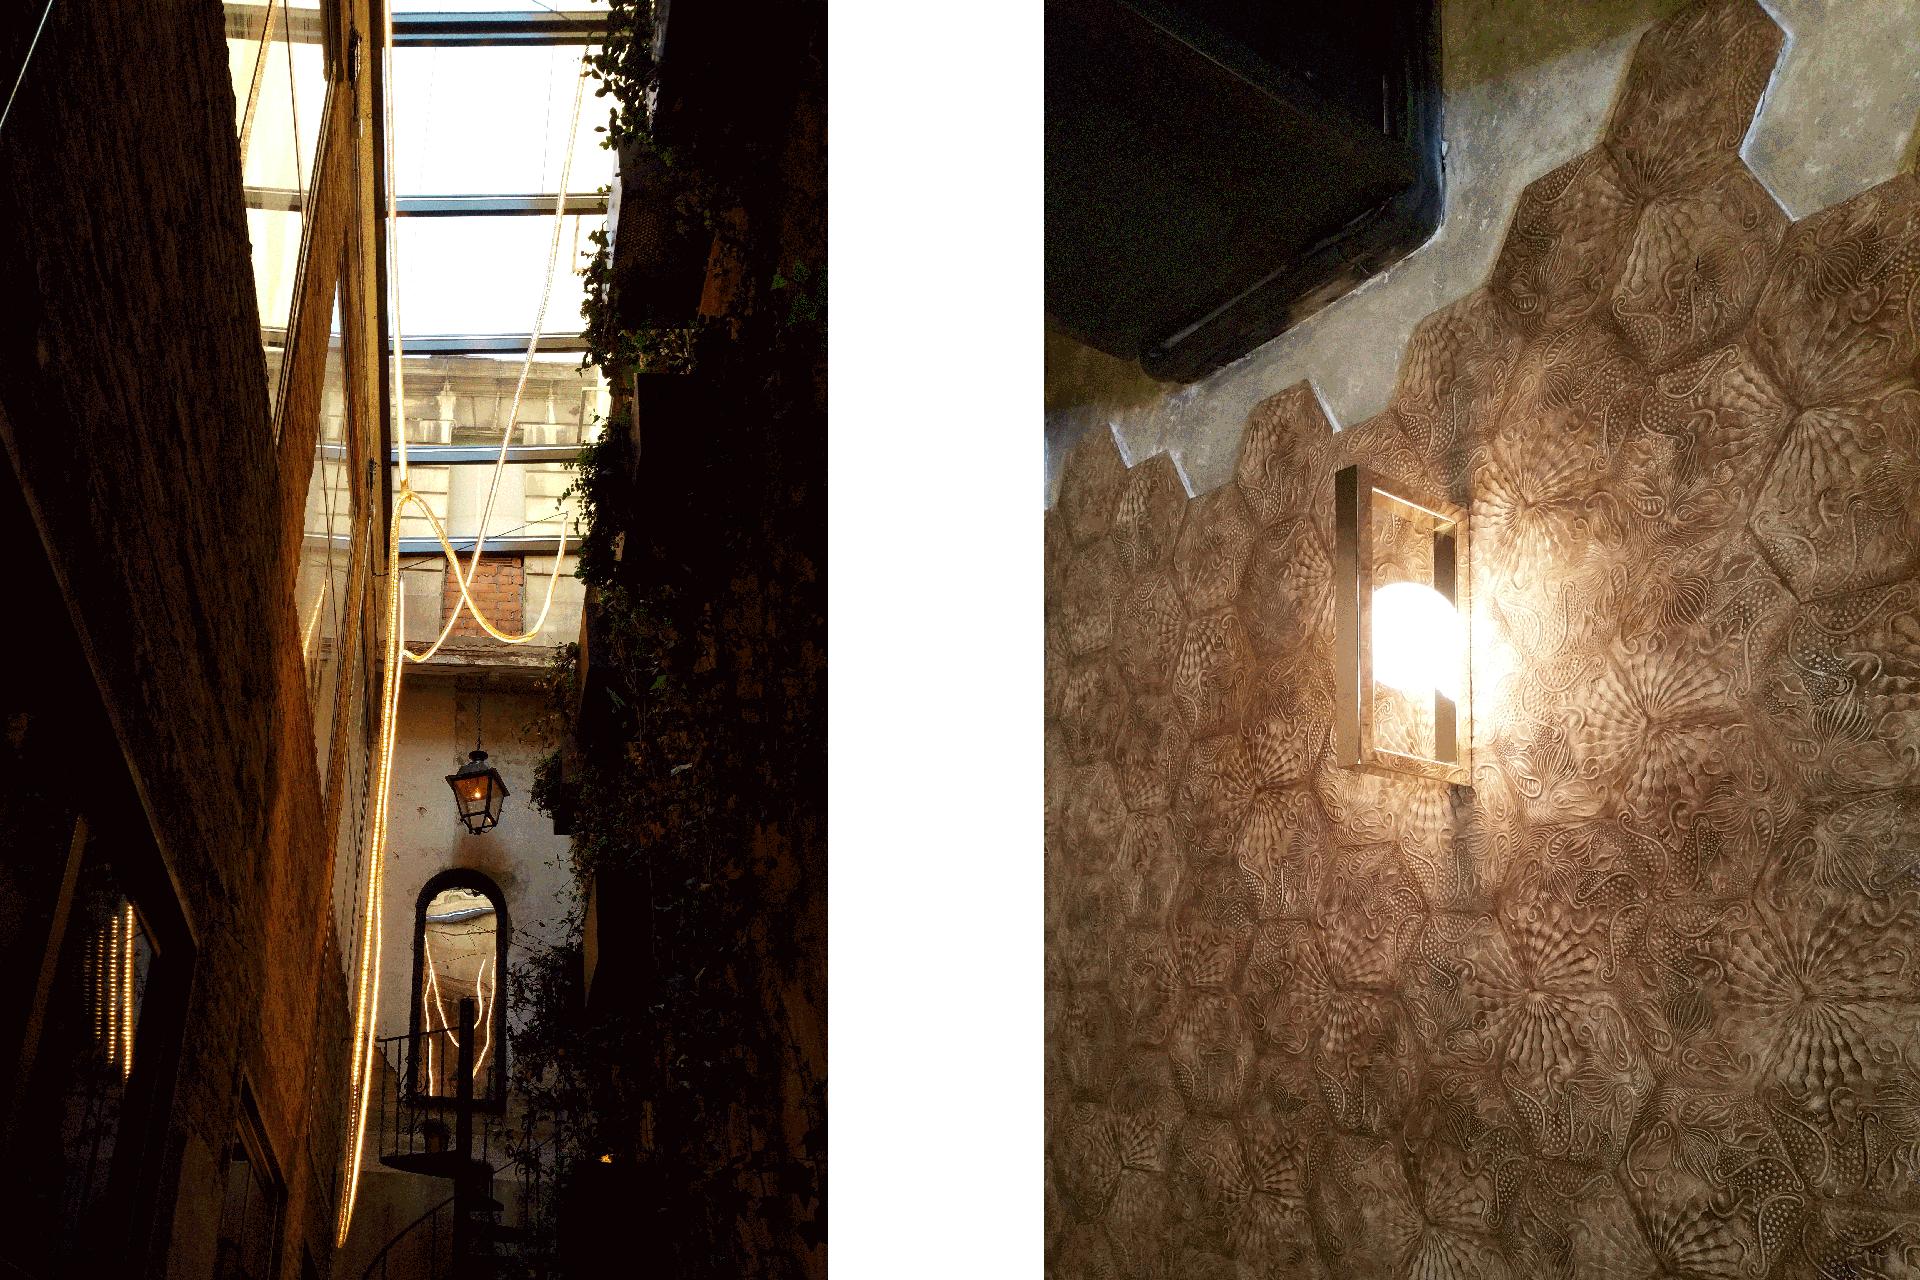 Lámpara a medida en Restaurante La Paisana de Casa Gracia de Barcelona